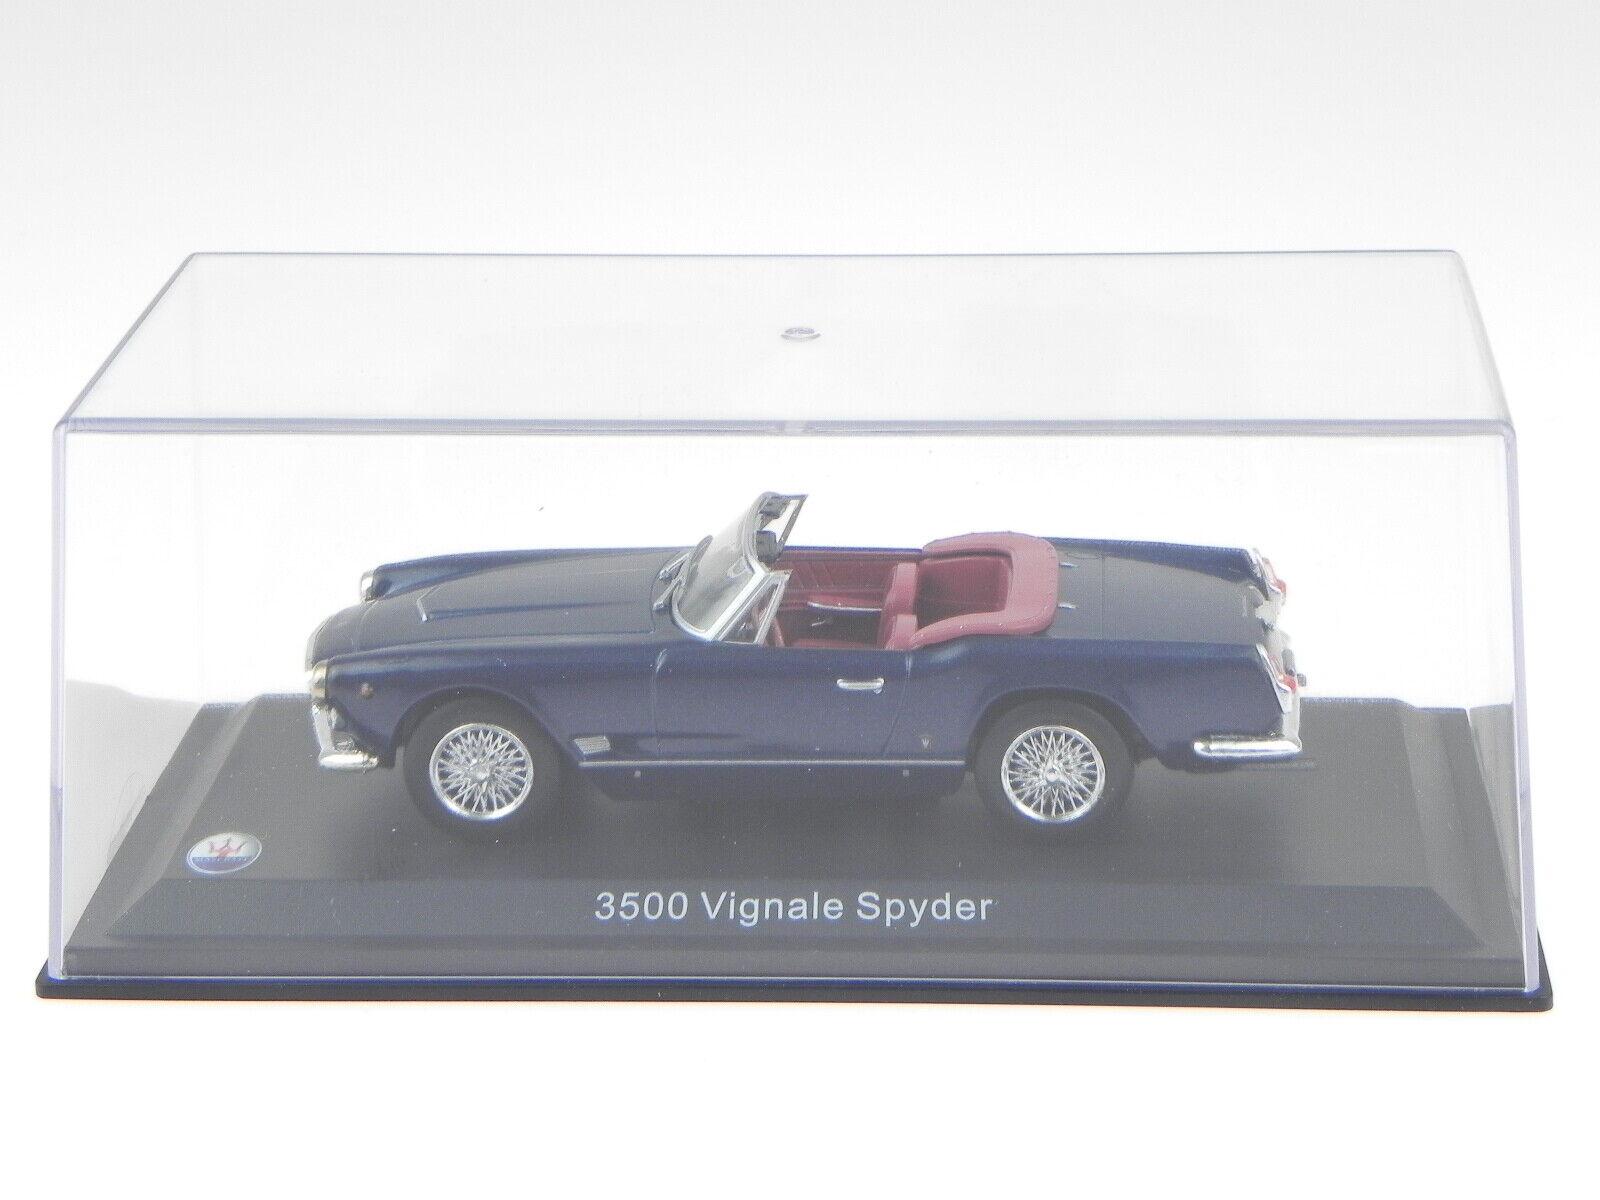 Maserati 3500 3500 3500 Vignale Spyder 1960 bluee diecast modelcar in showcase 1 43 9ec137